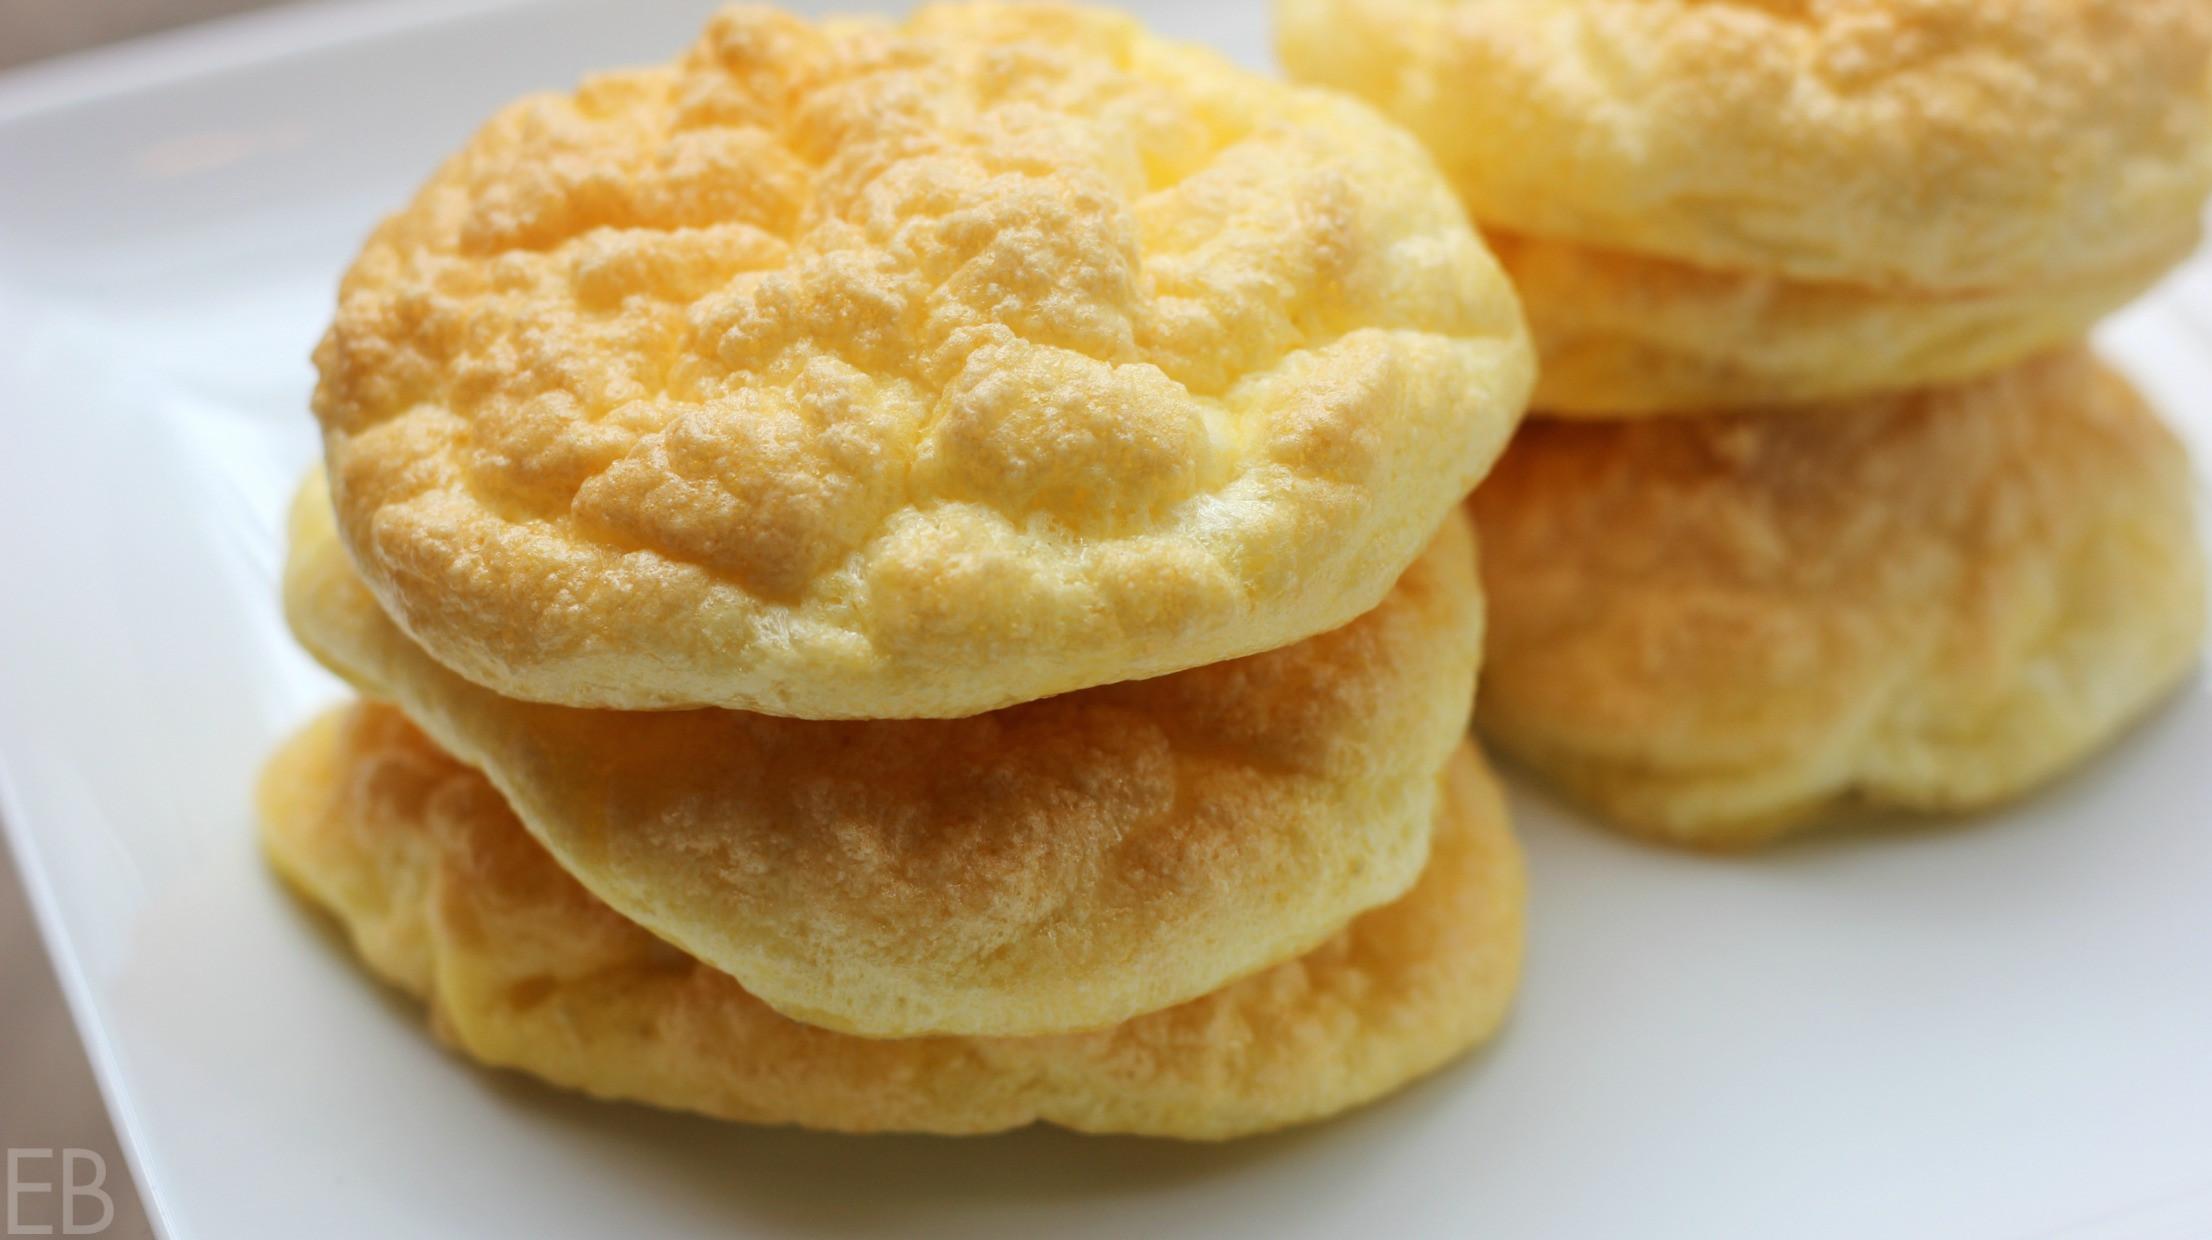 Keto Bread Whole Foods  Cloud Bread KETO Paleo GAPS Diet High Protein Low